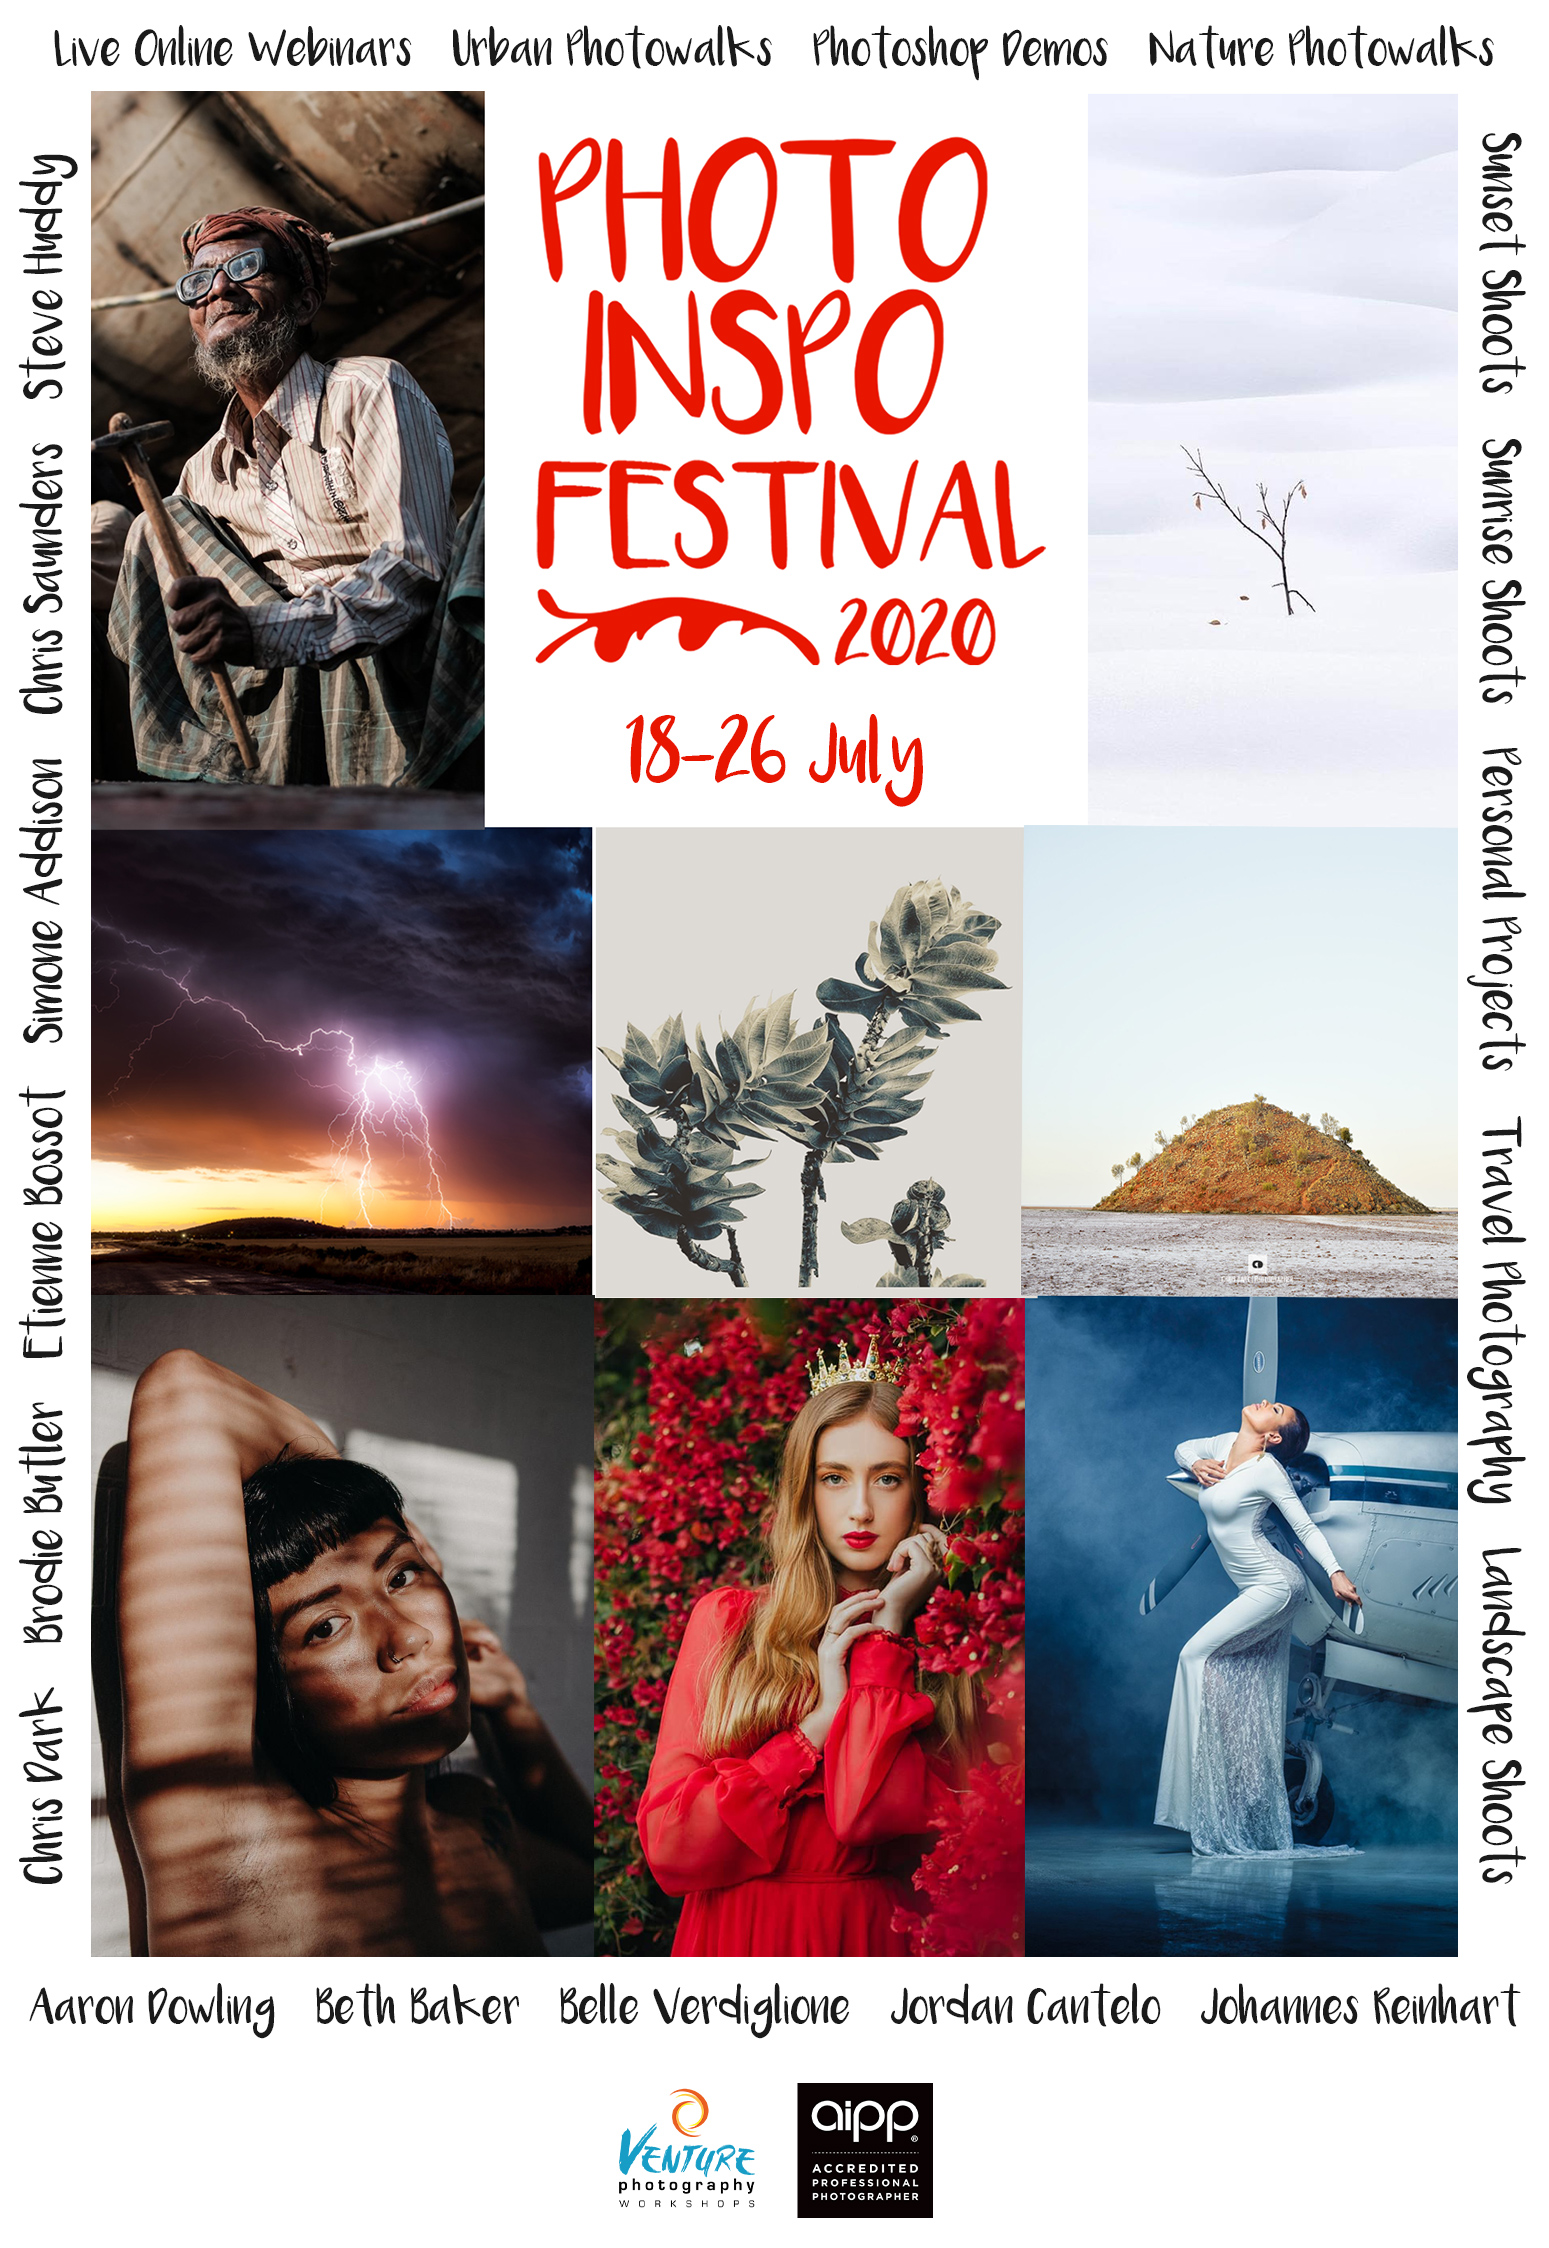 Photo Inspo Festival 2020